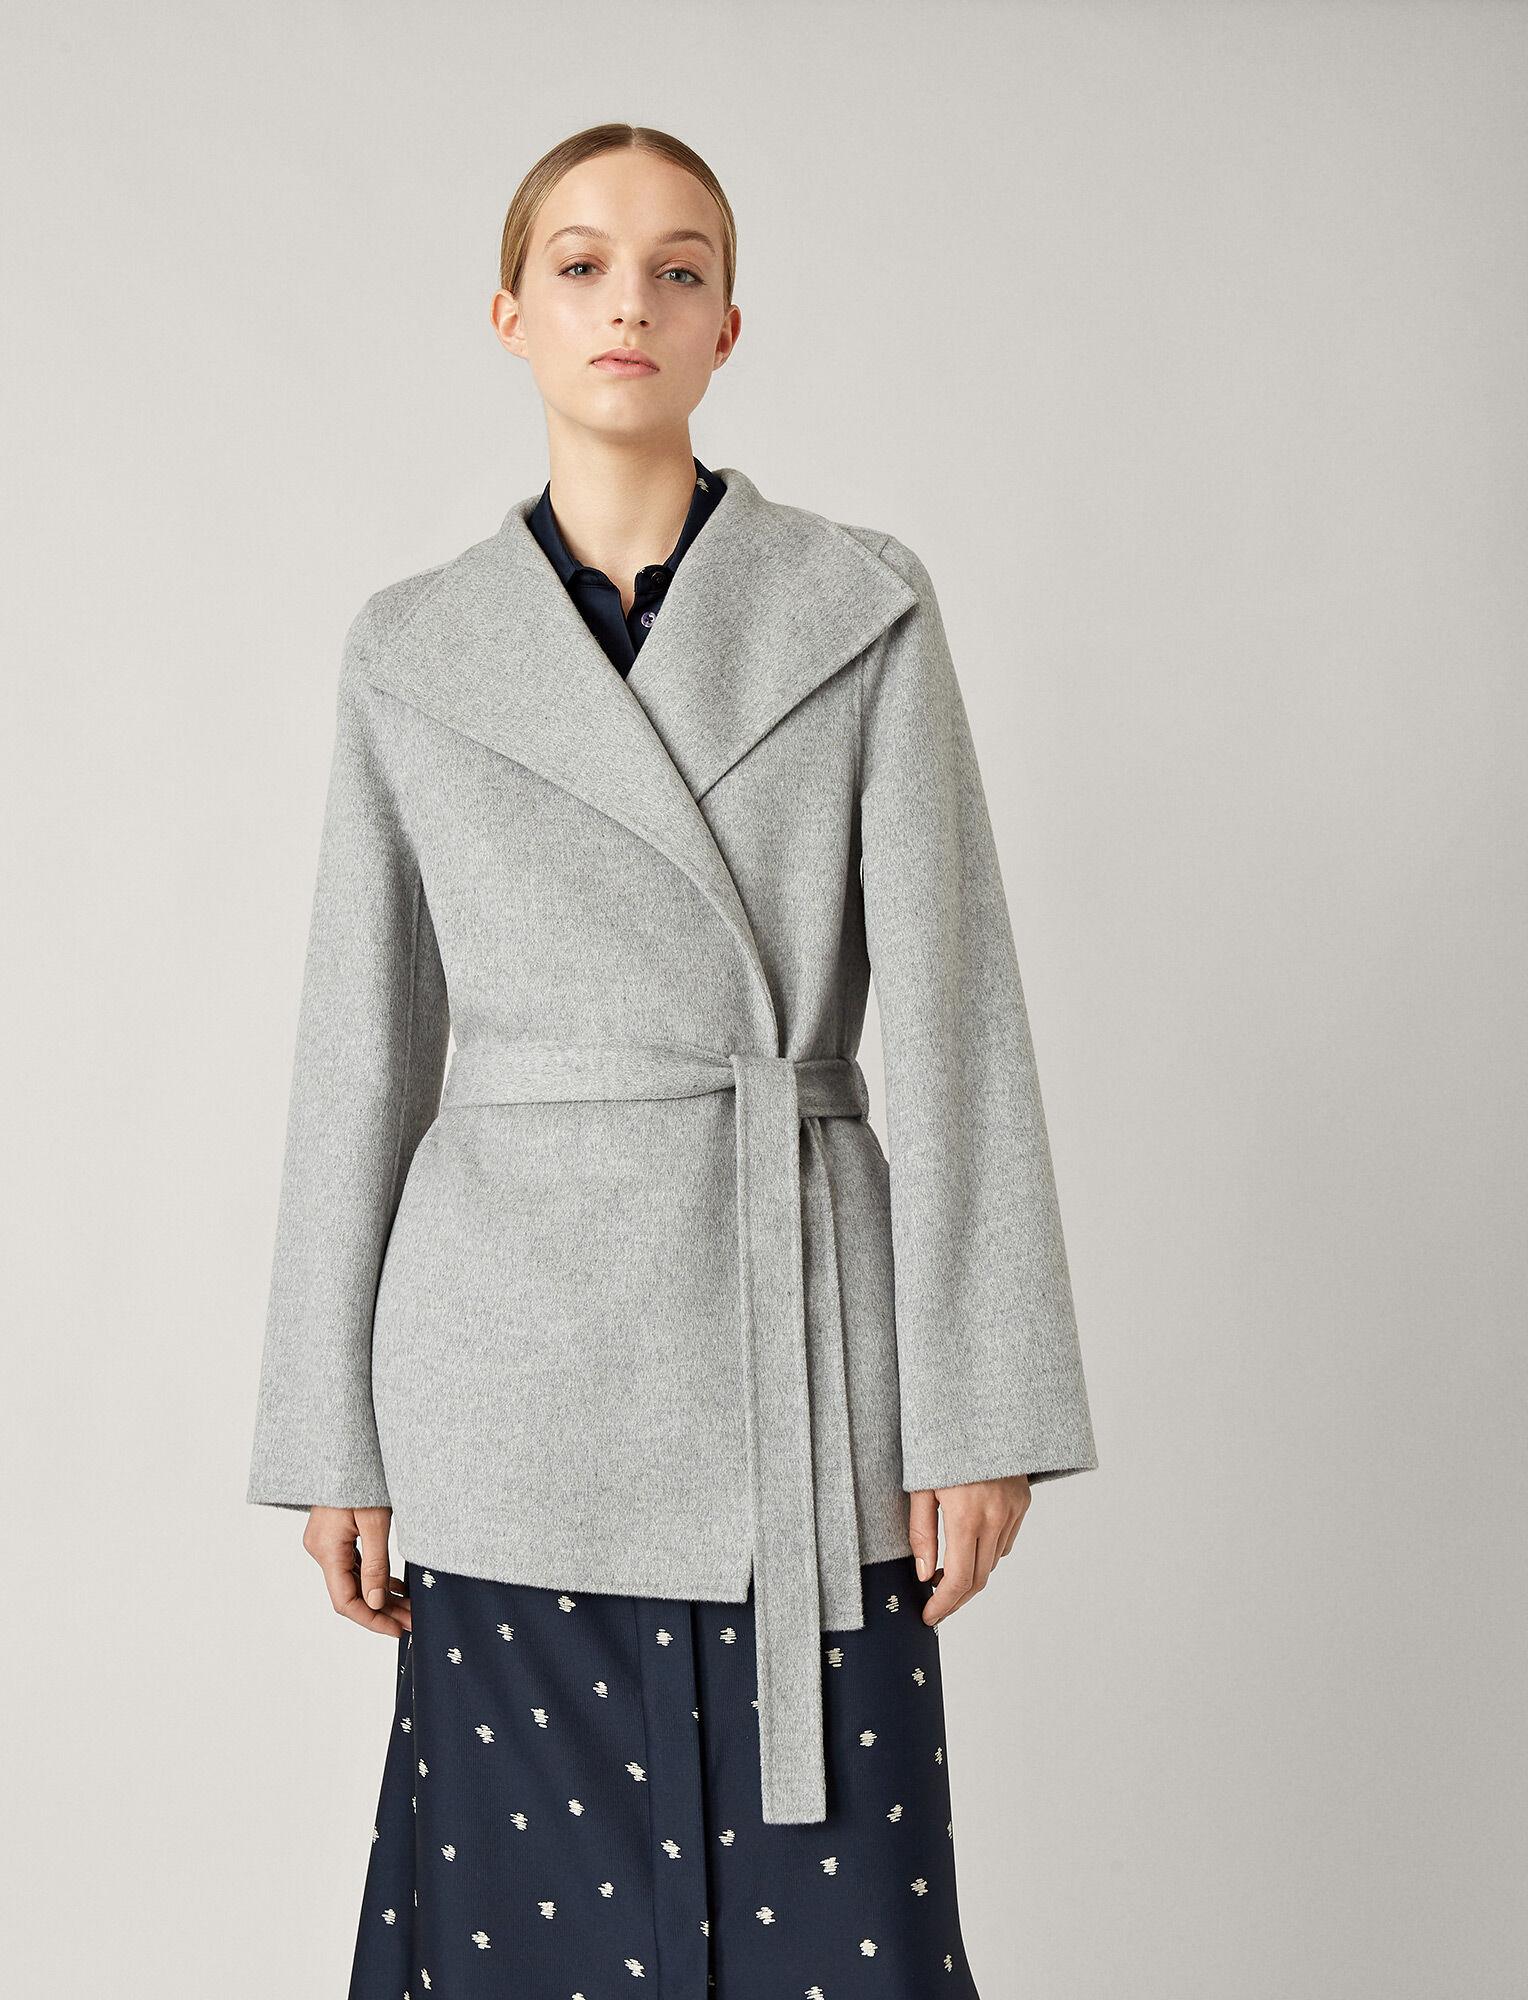 Joseph, Lima Short Double Face Cashmere Coat, in GREY